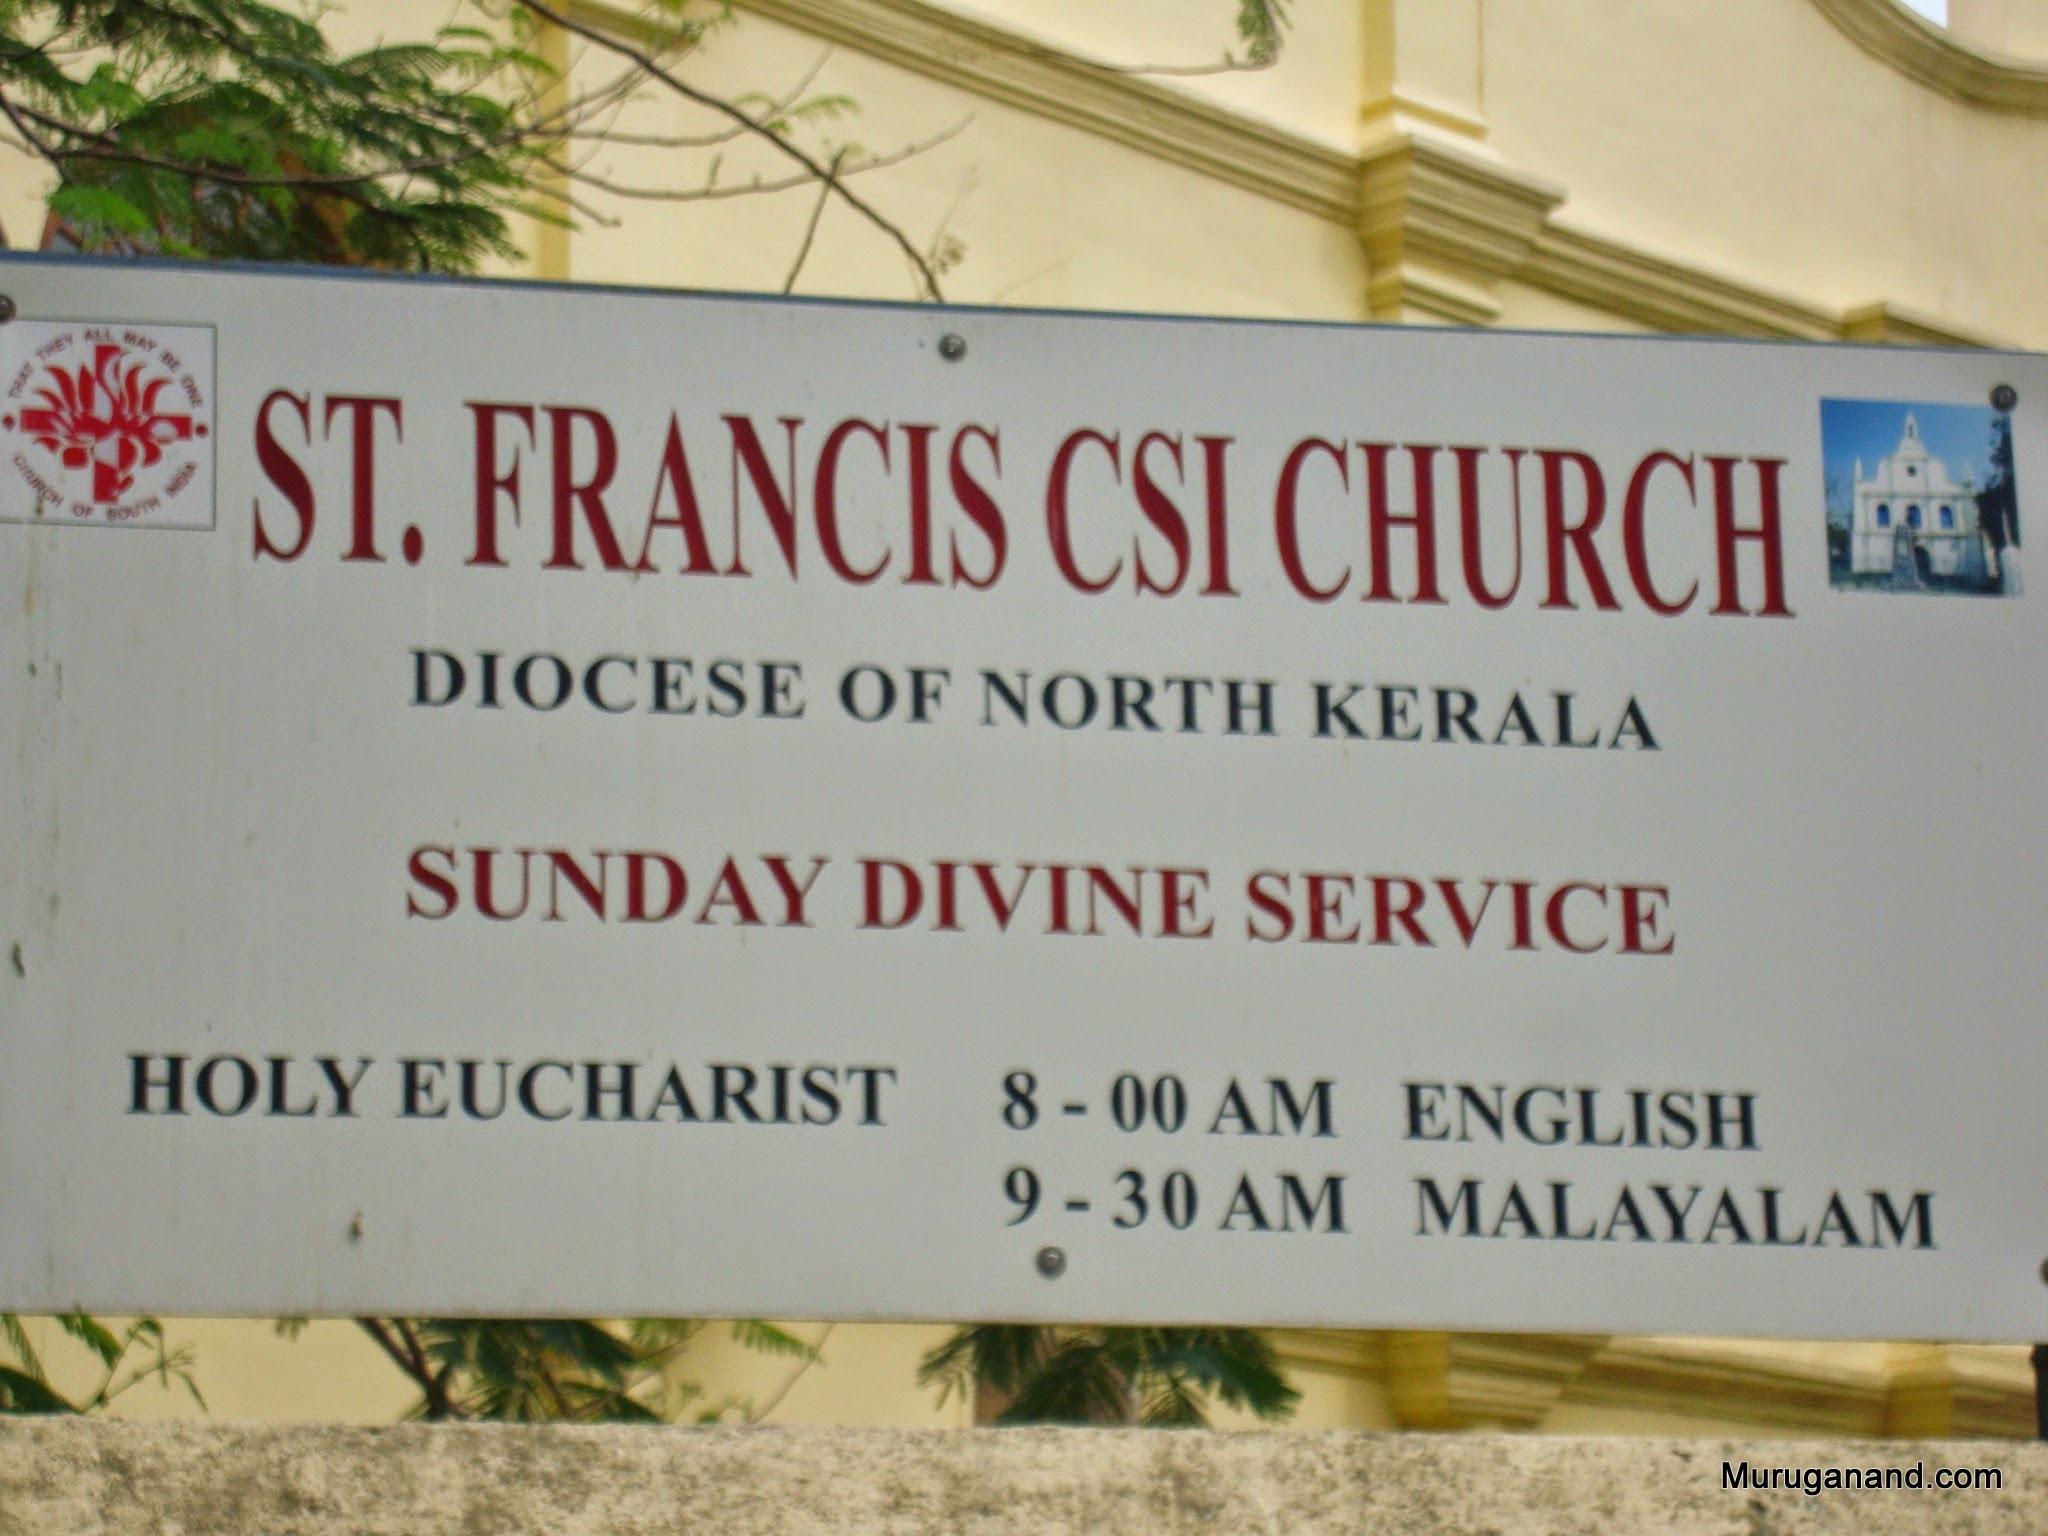 Oldest European Church in India- Built in 1503